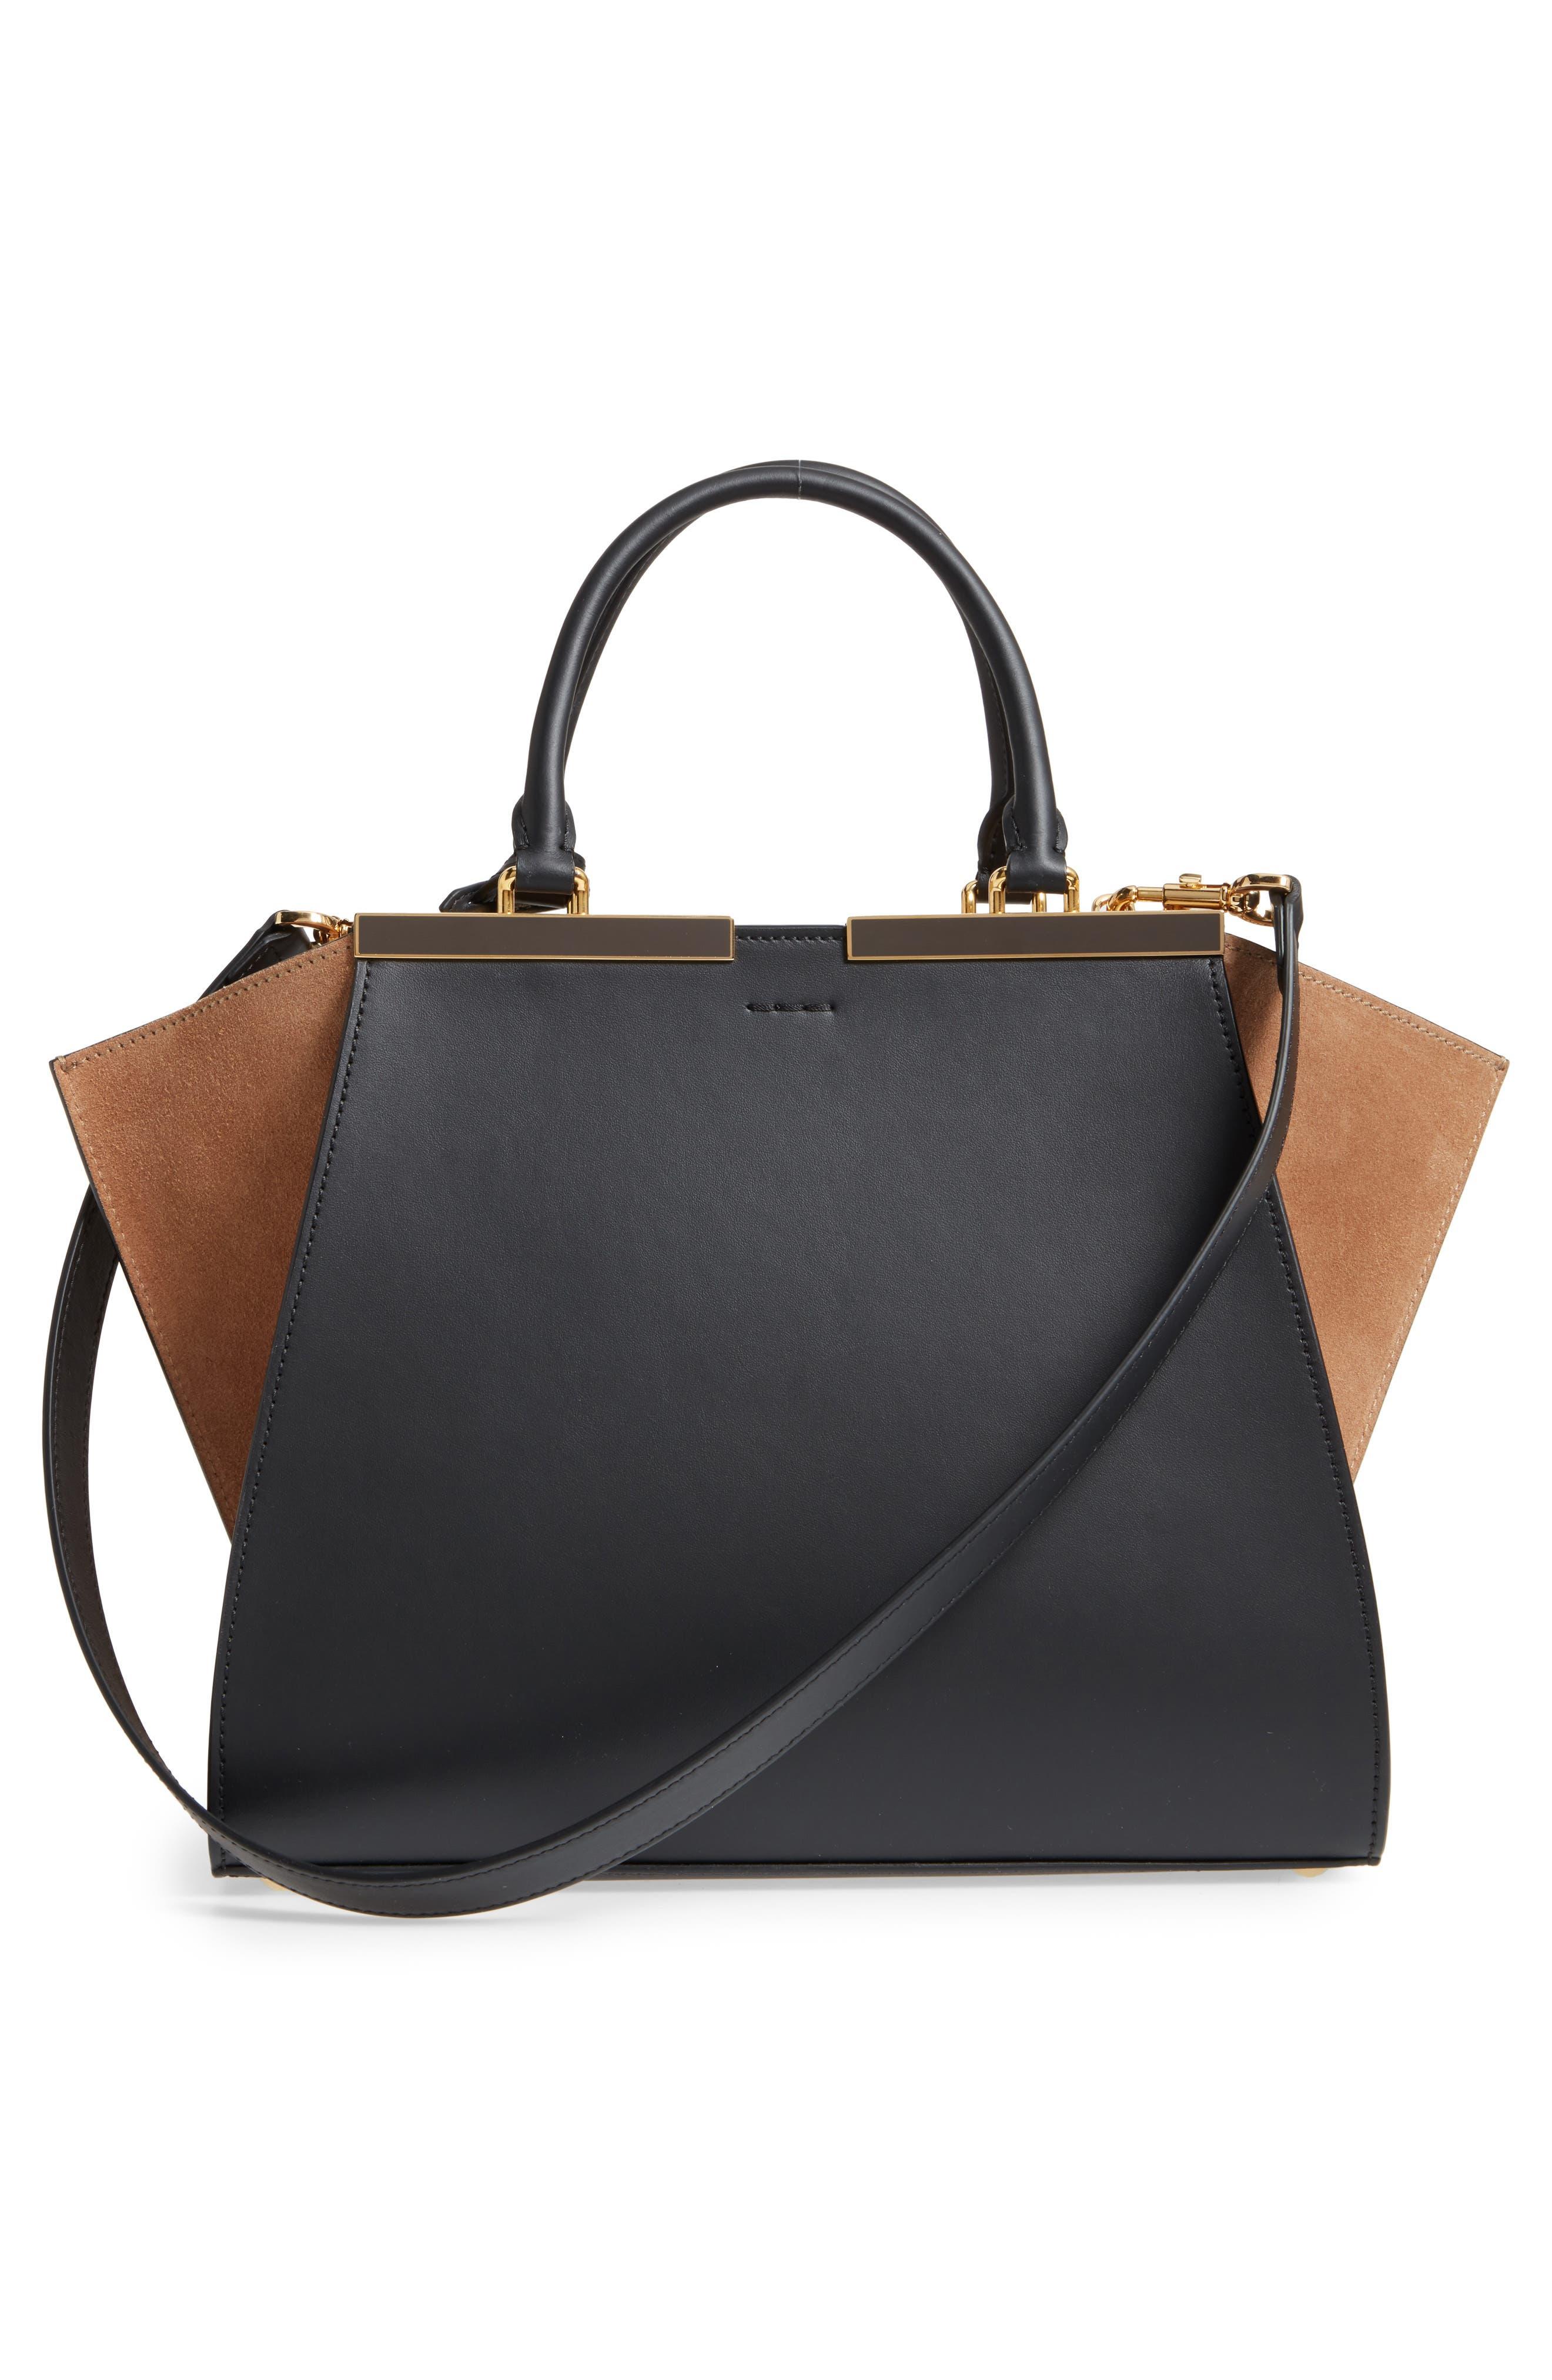 3Jours Leather & Suede Shopper,                             Alternate thumbnail 3, color,                             Black/ Brown